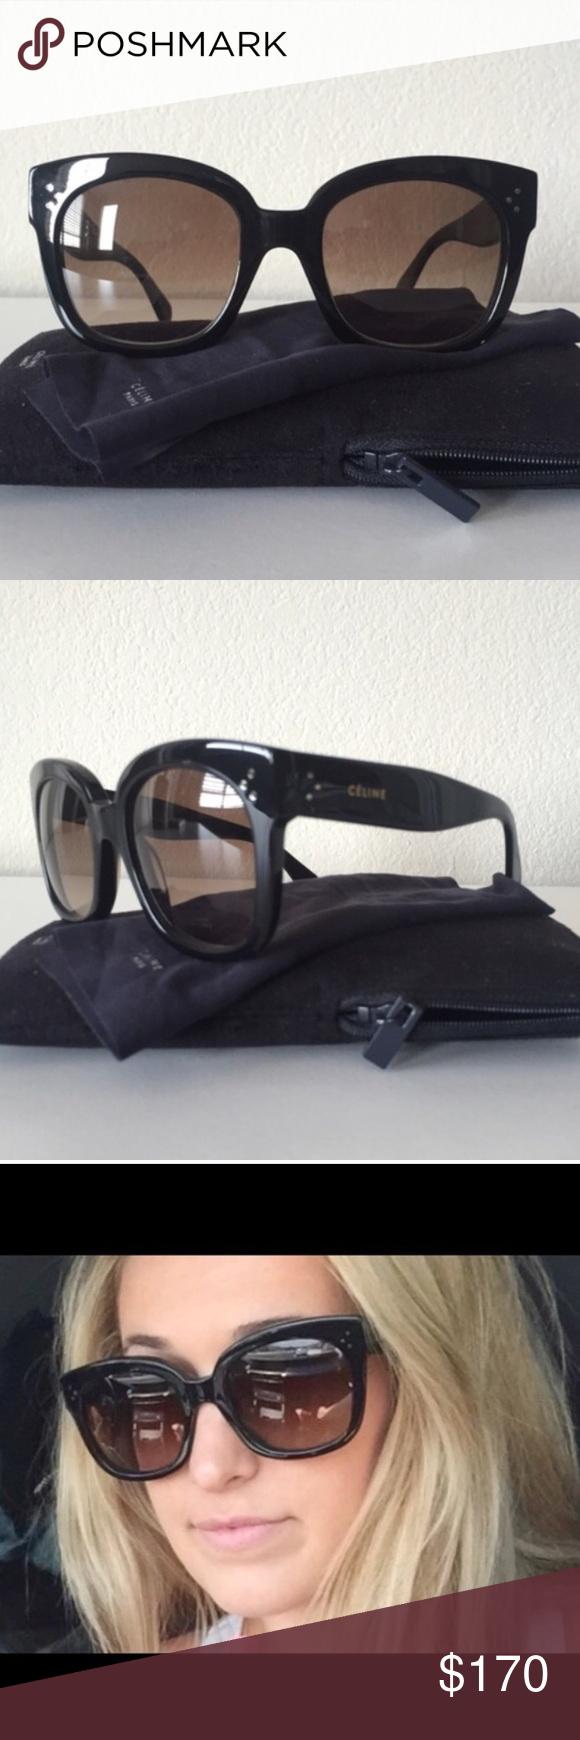 e4fc61a43372 Céline New Audrey CL 41805 S 807HA Céline New Audrey CL 41805 S 807HA  sunglasses. Black frame with brown gradient lenses. Have only been worn  once